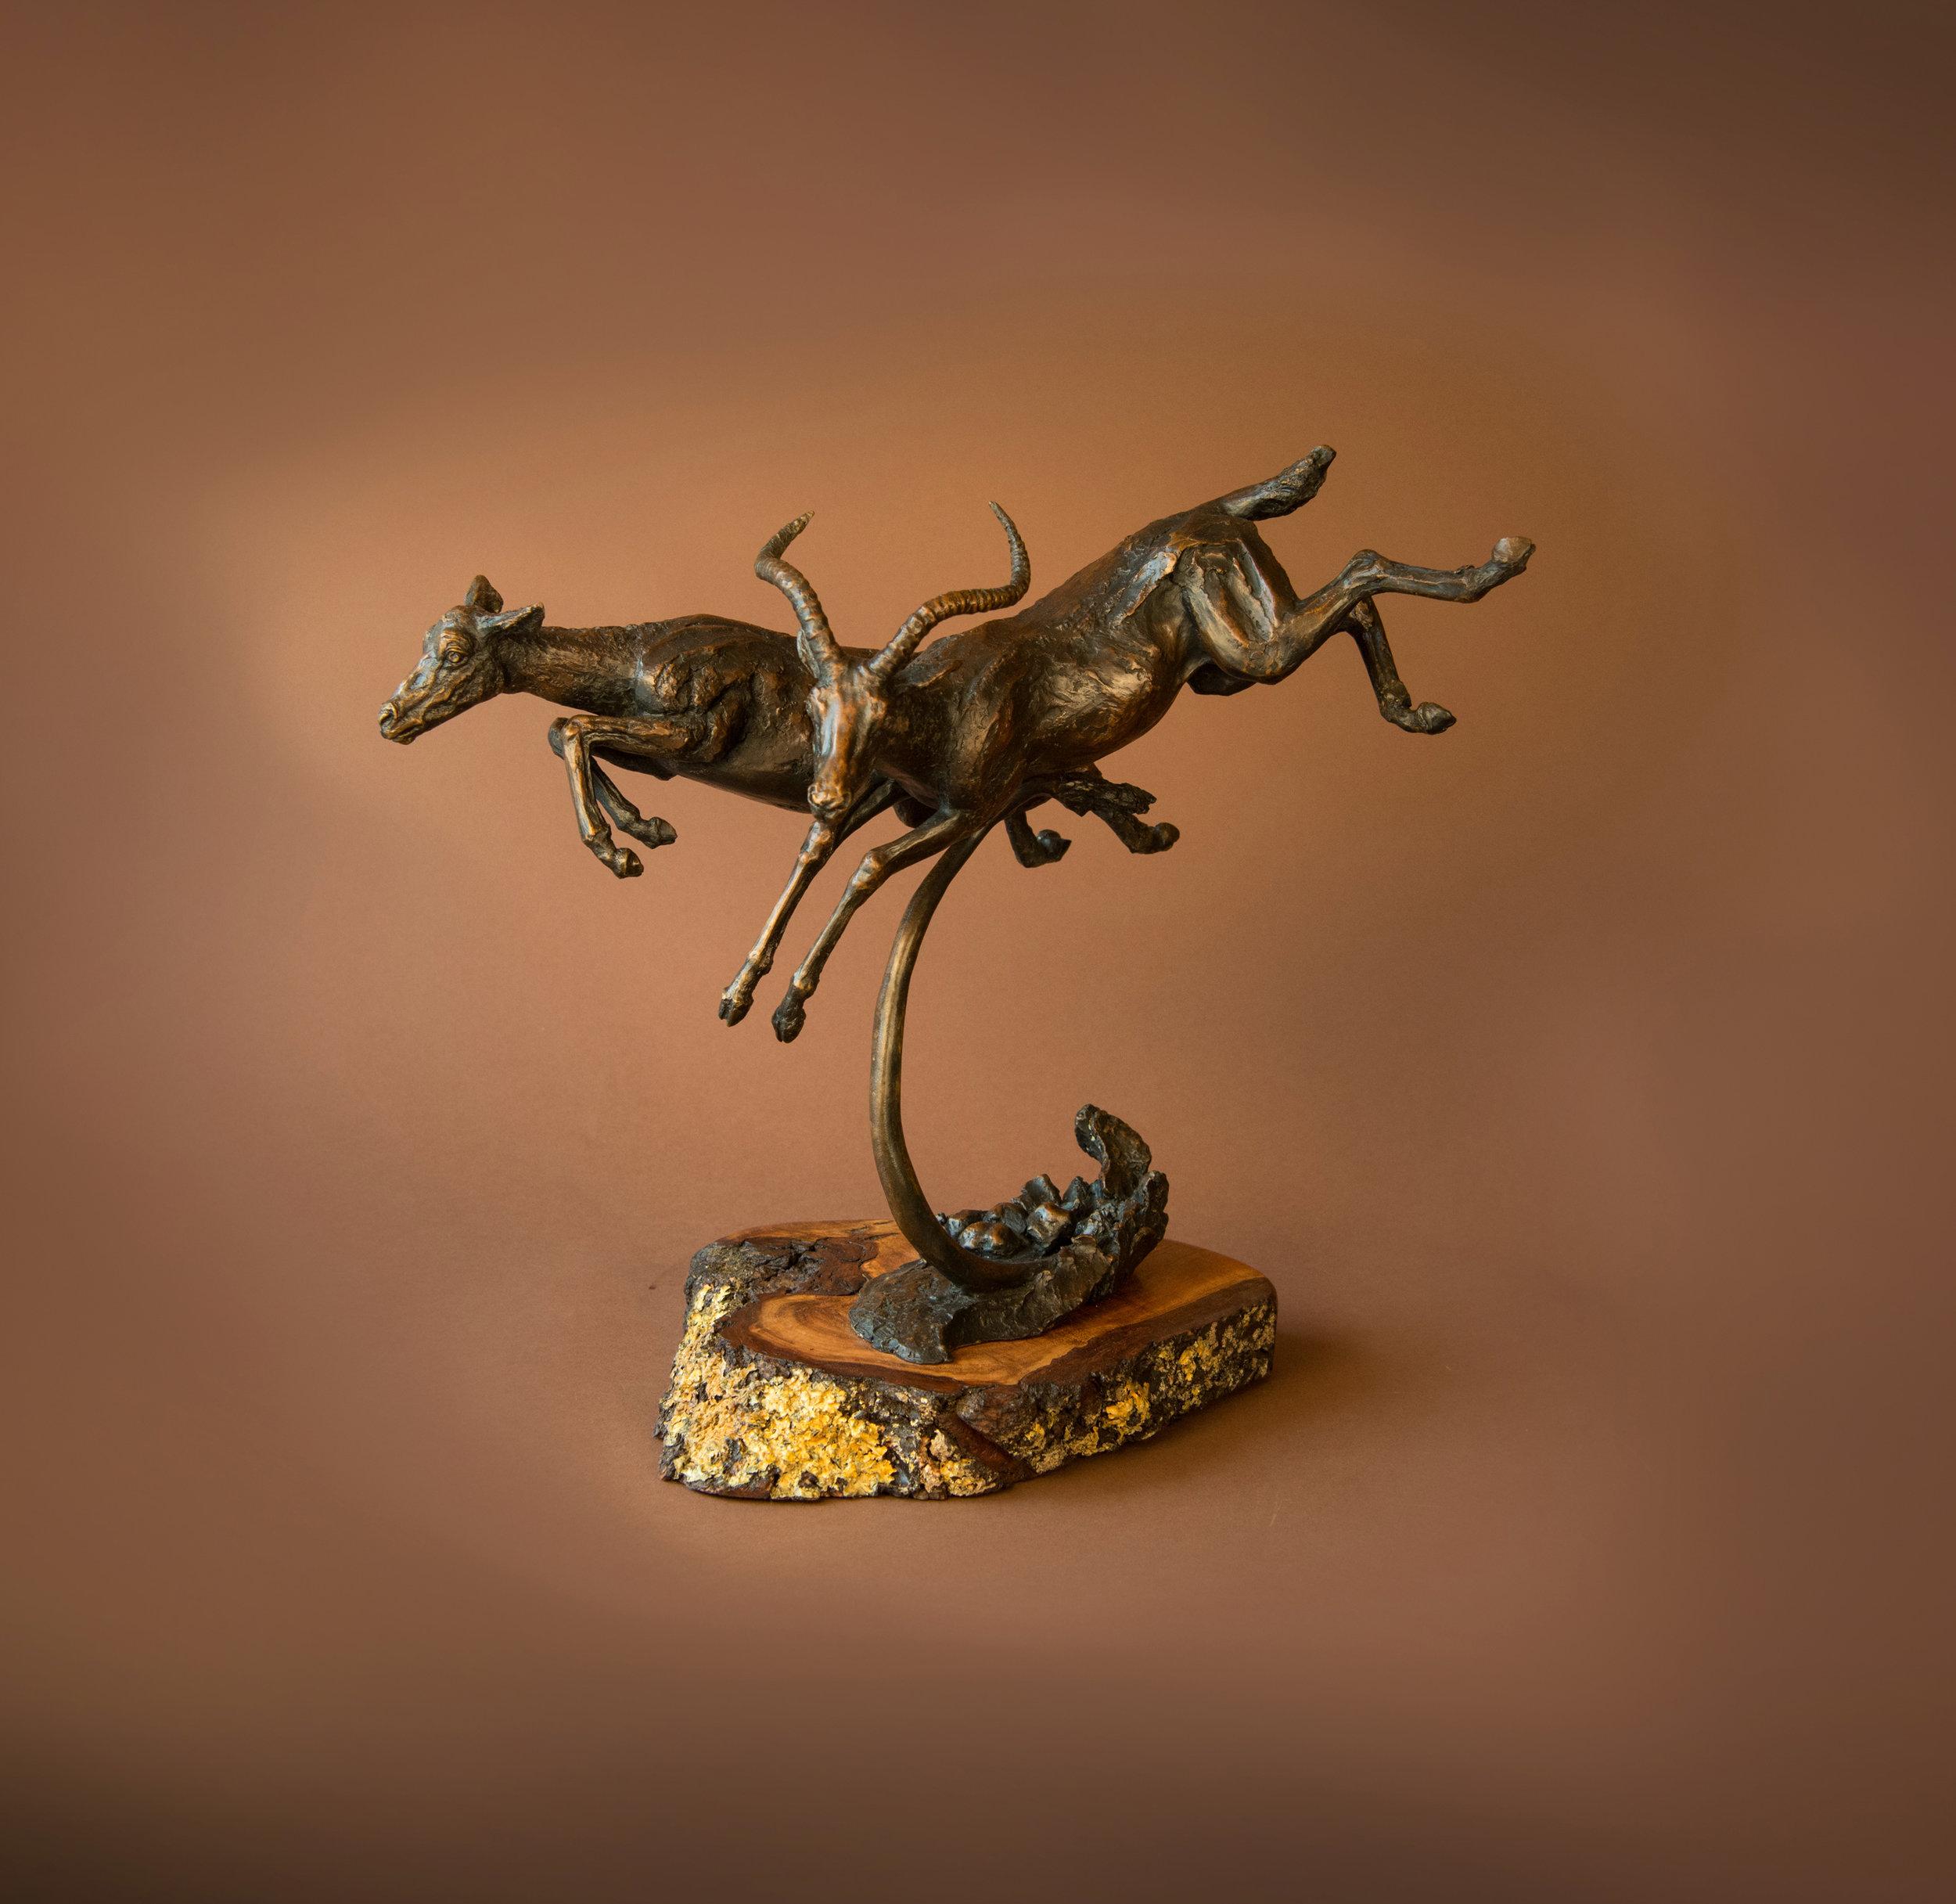 antelopes03 copy.jpg